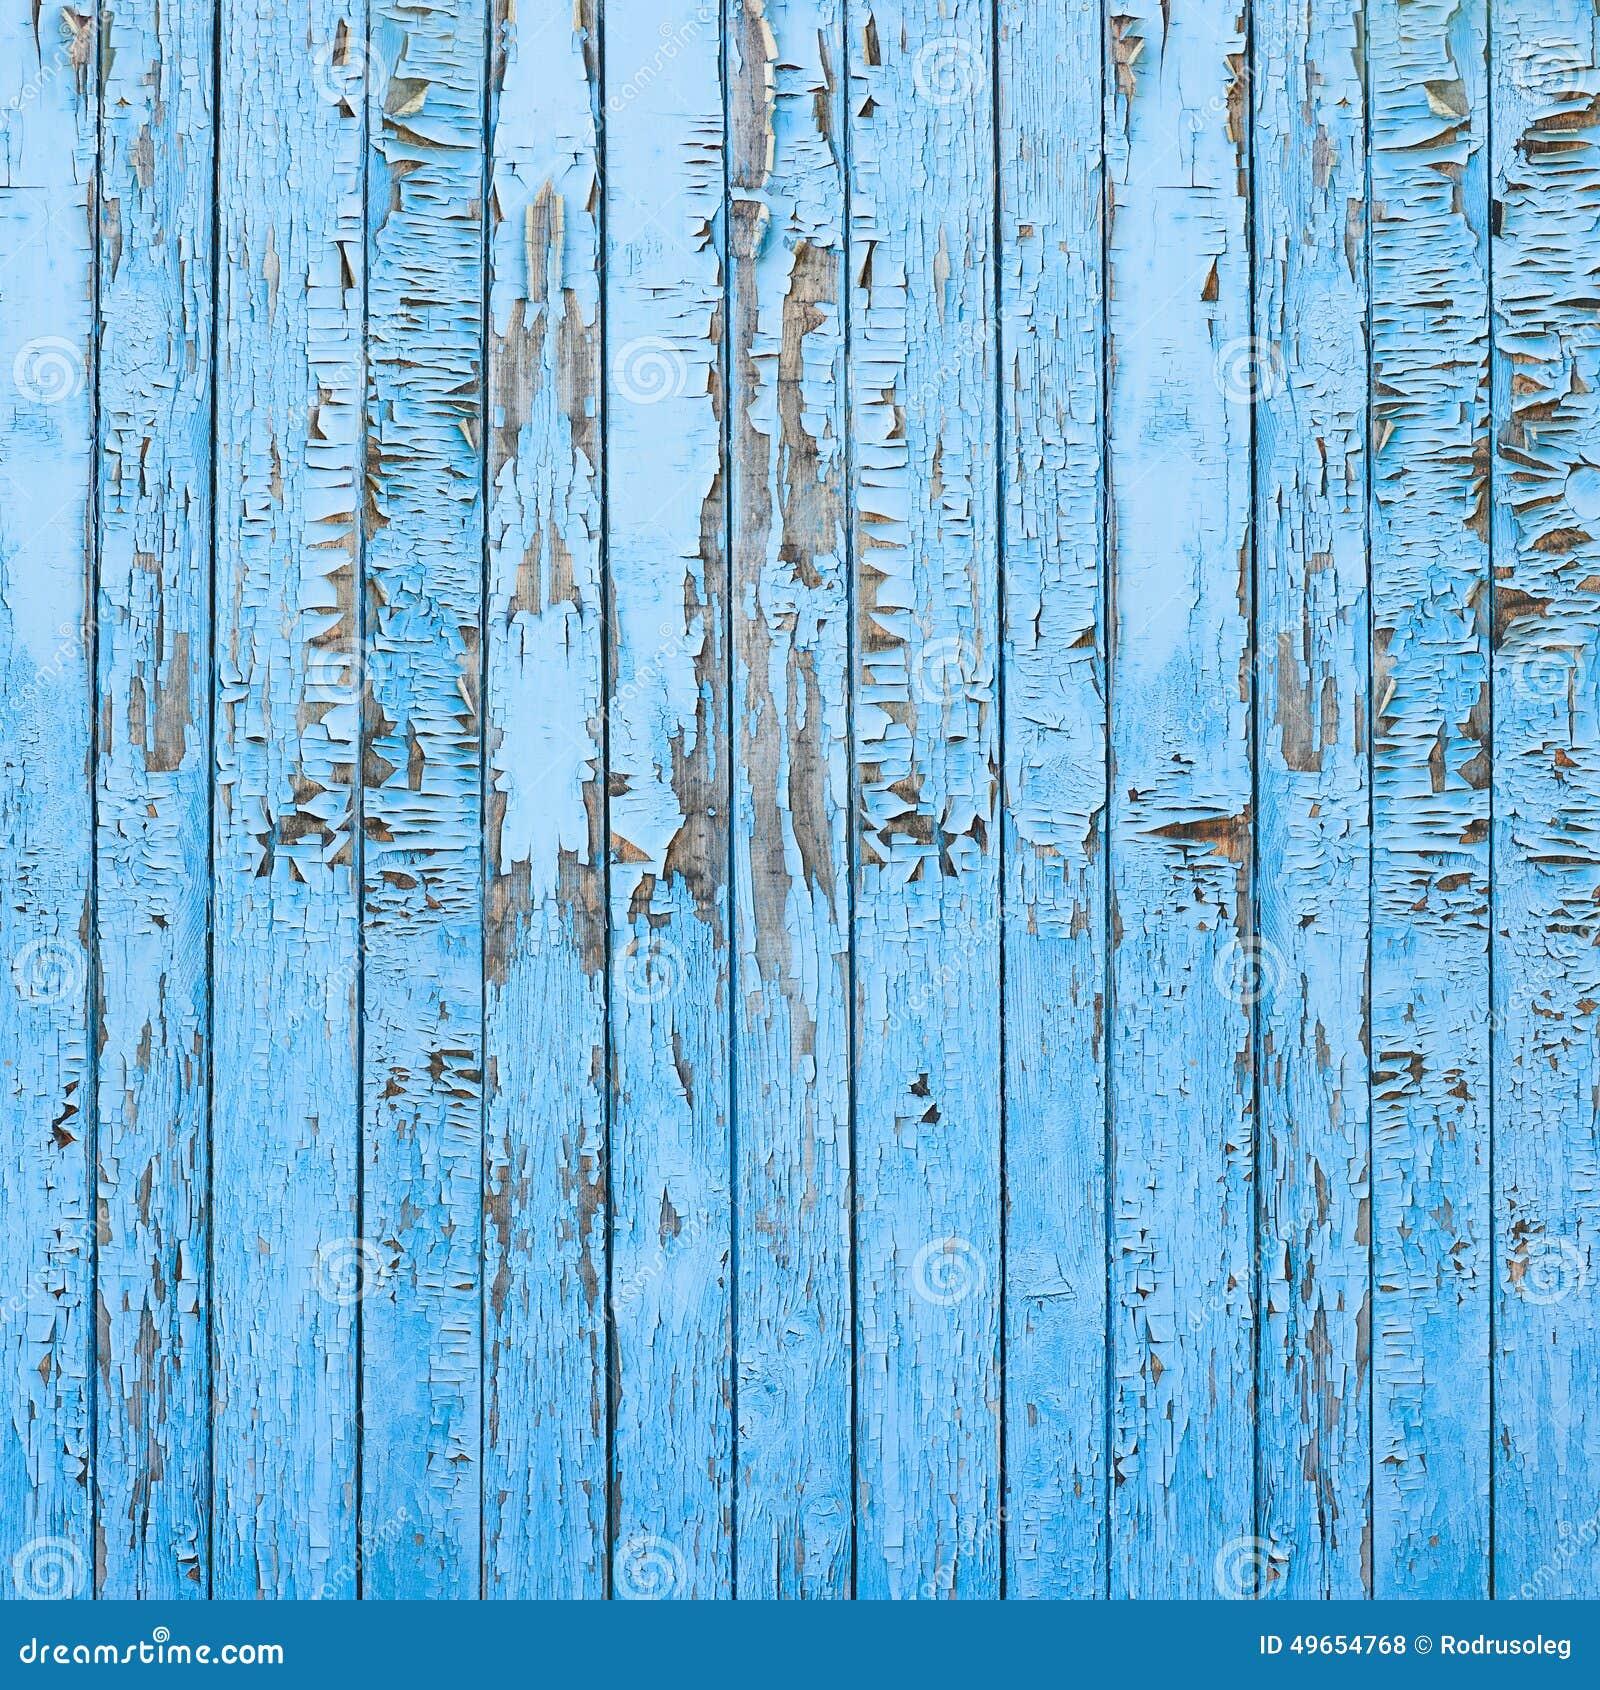 vintage blue wood background - photo #27